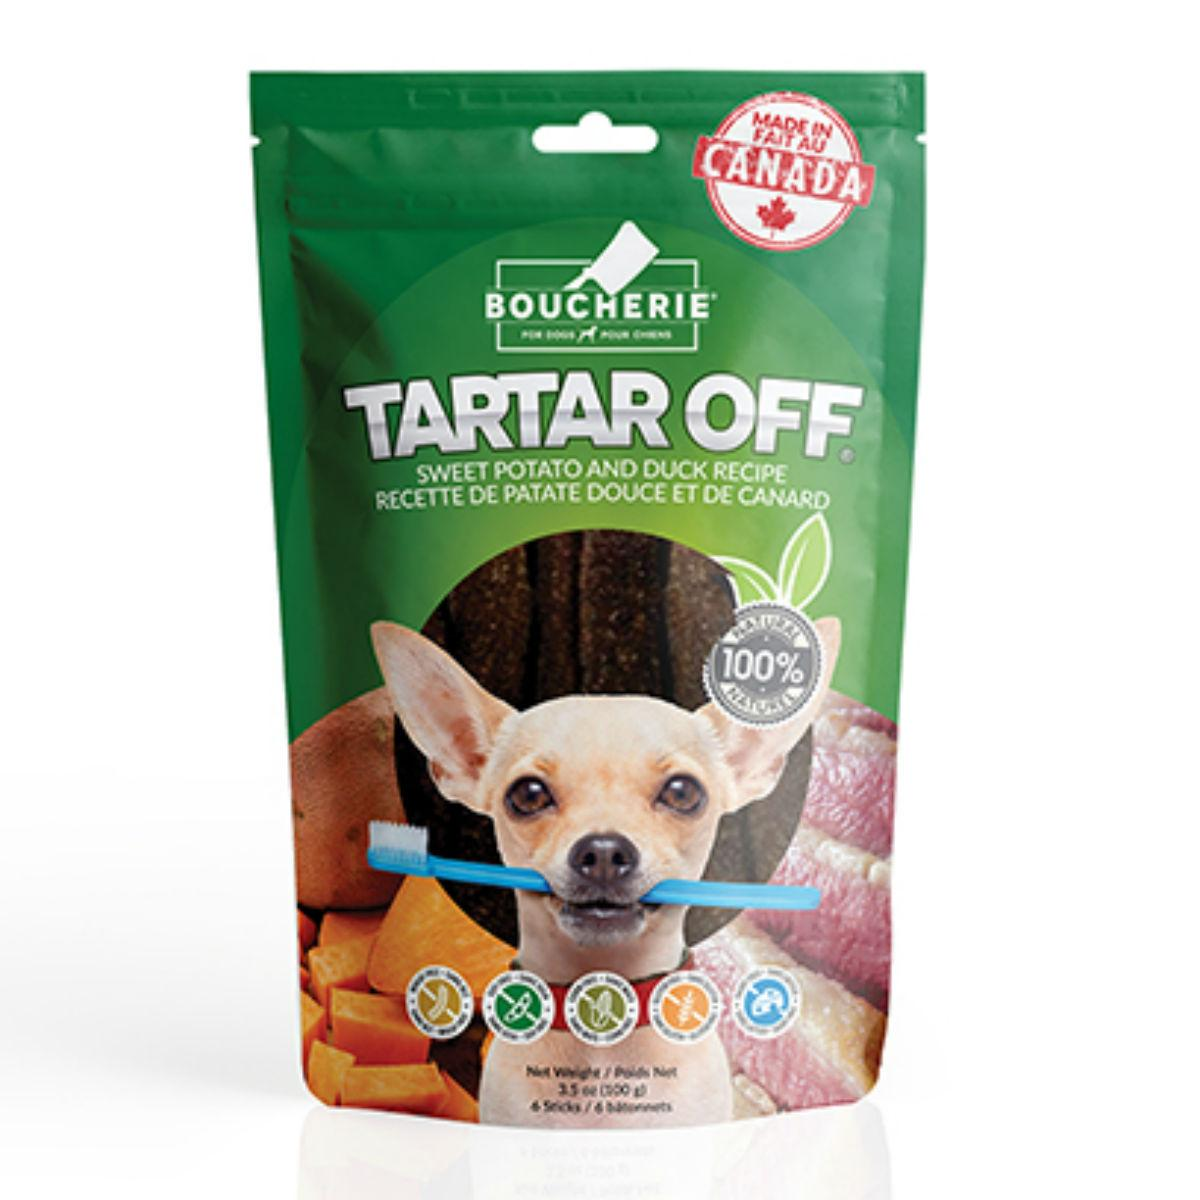 Boucherie Tartar Off Dog Treat - Sweet Potato with Duck Liver